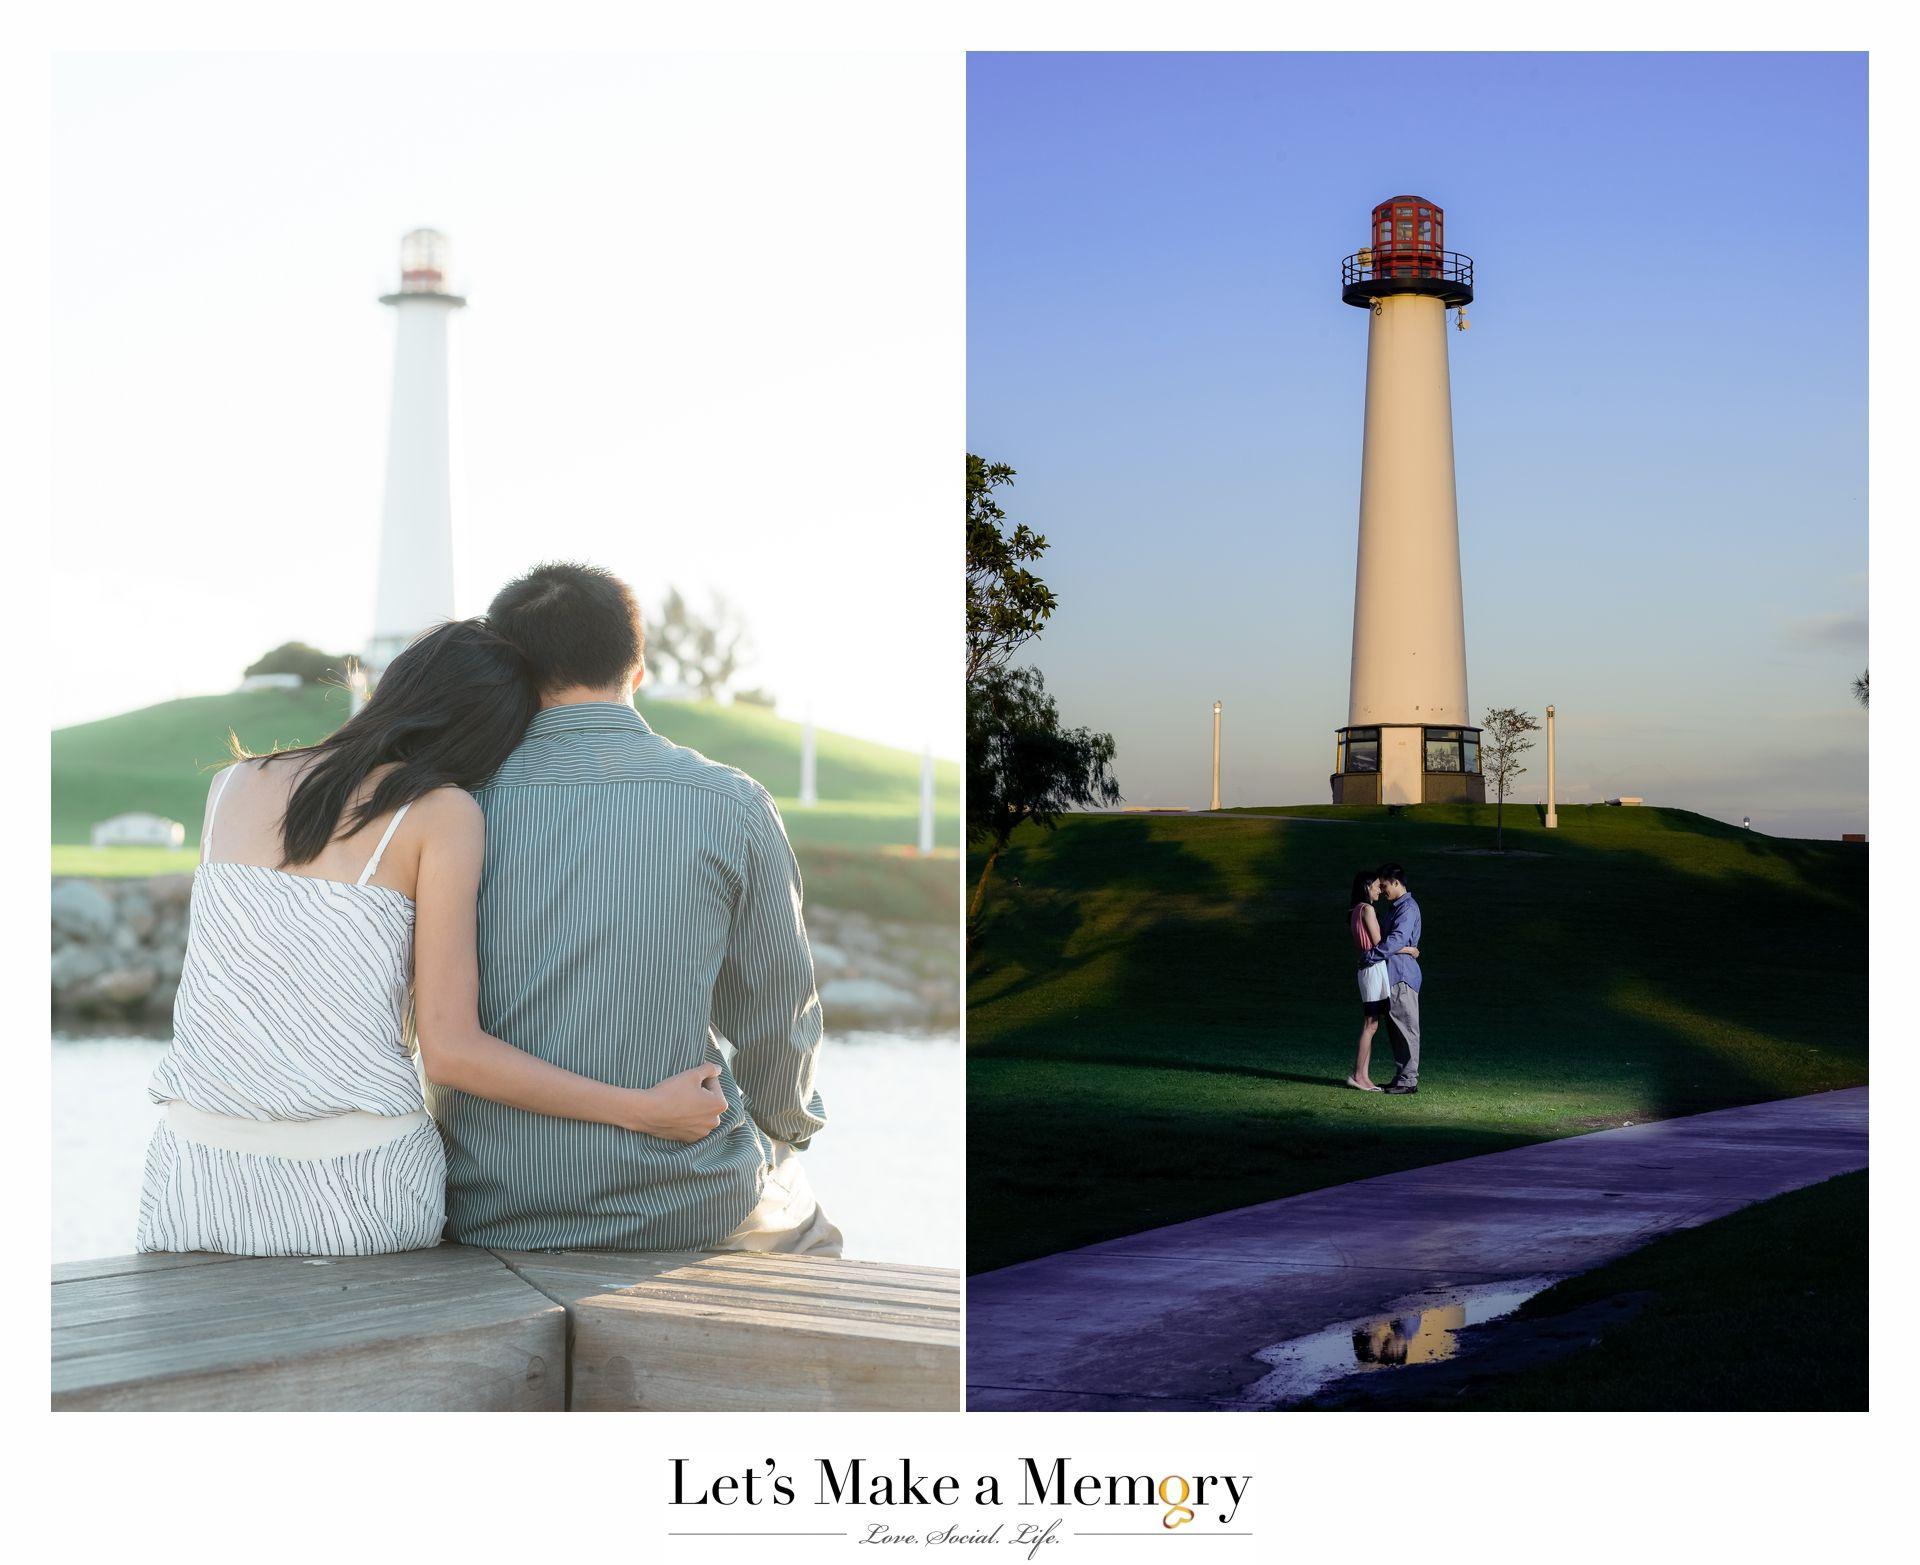 Long beach lighthouse wedding  Vanessa and Ken PreWedding Engagement  Lets Make A Memory